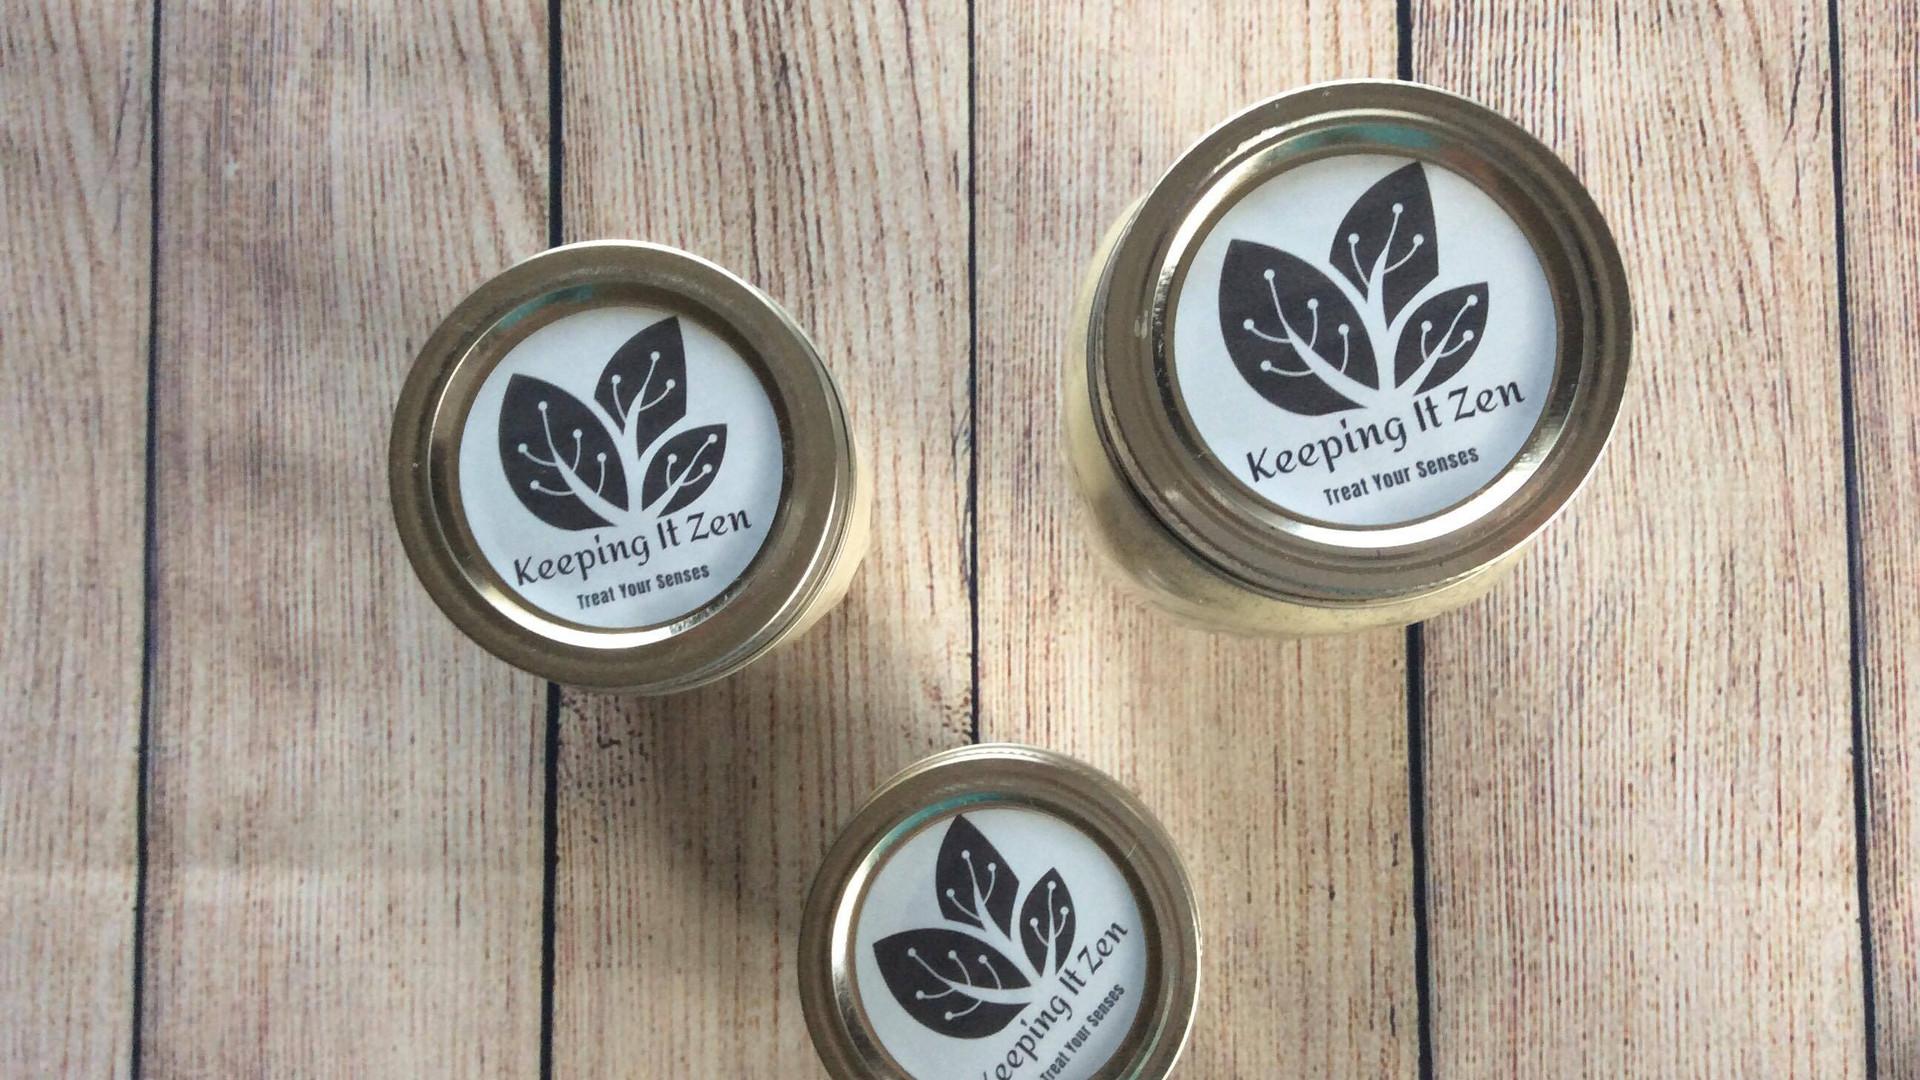 Mason jar candle collection